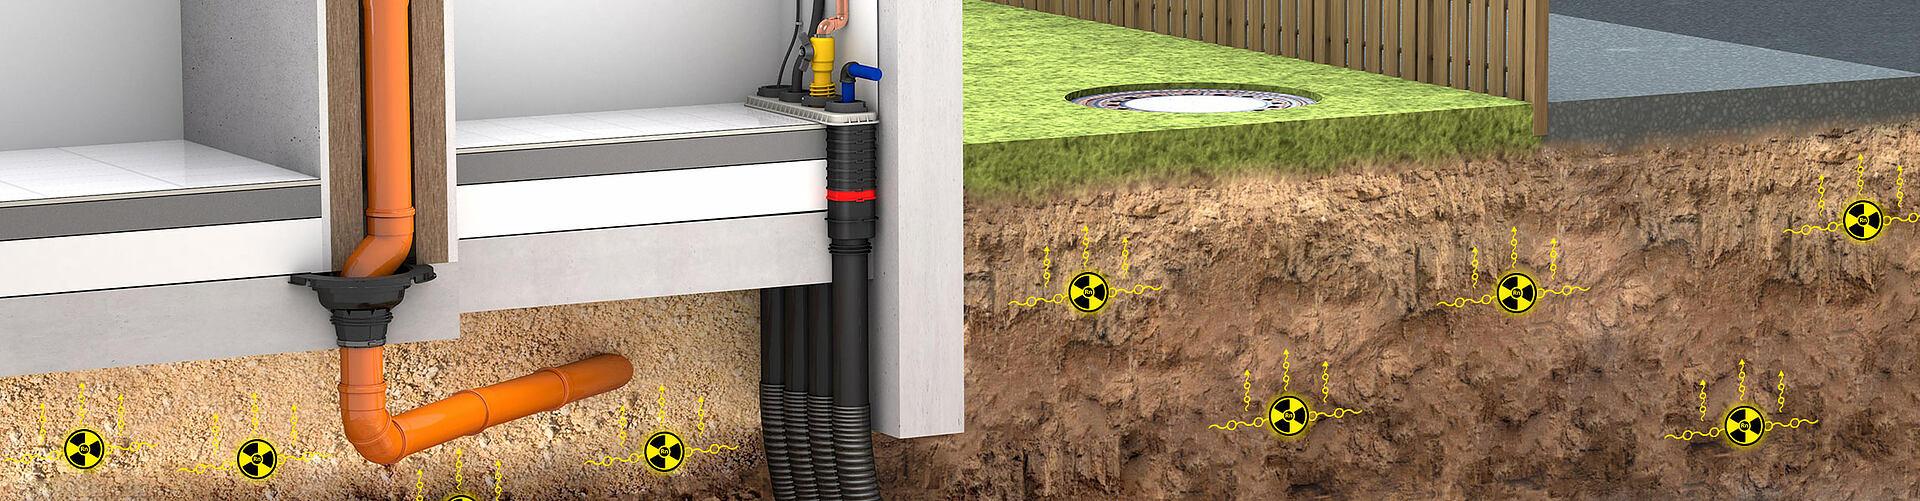 Radon-safe construction